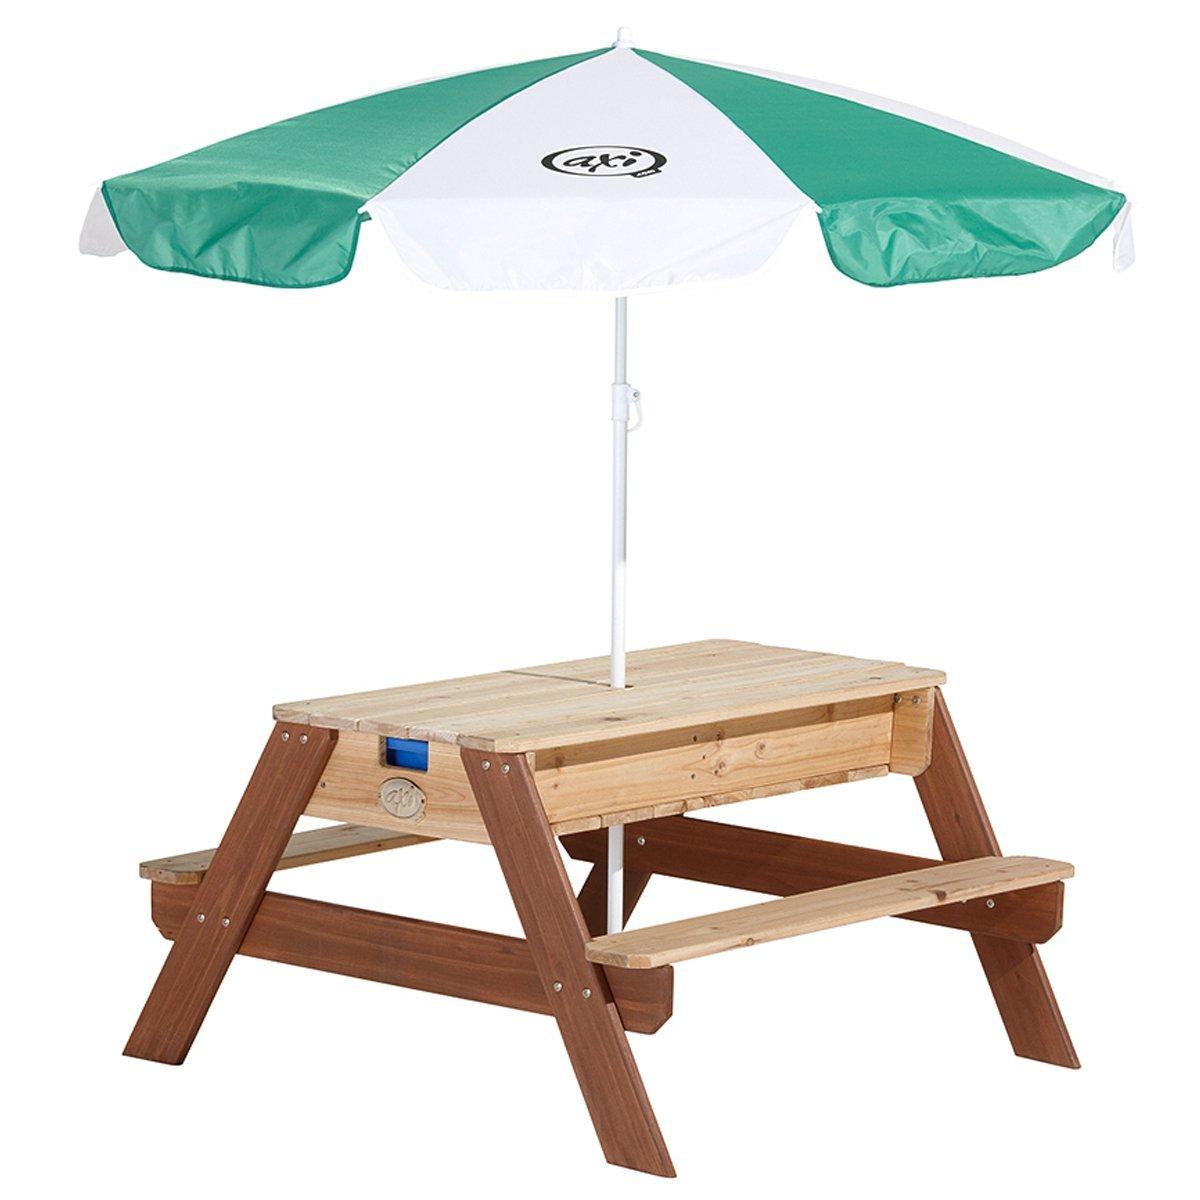 Matschtisch Holz - Axi Nick Wassertisch, Sandtisch, Picknicktisch